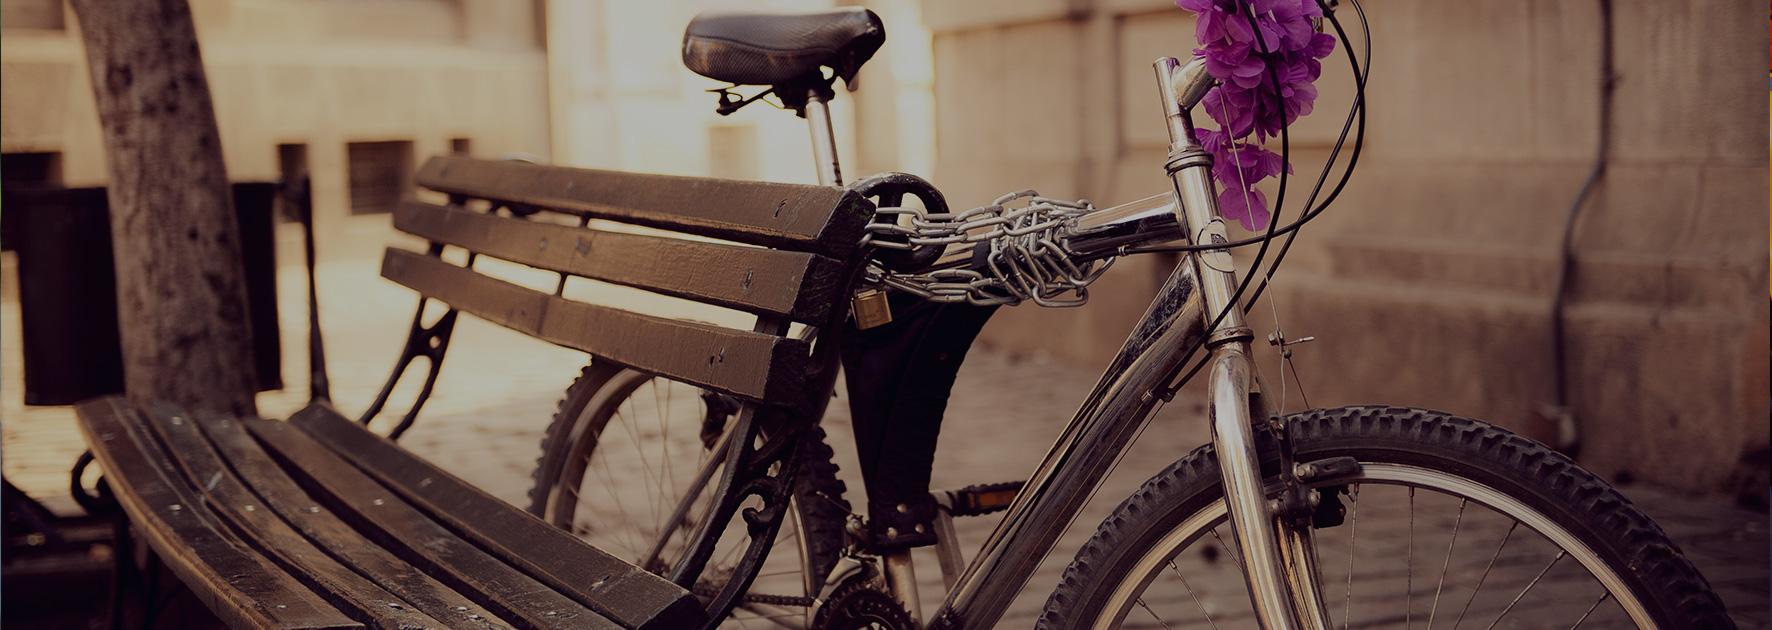 In bicicletta fino ad Auschwitz